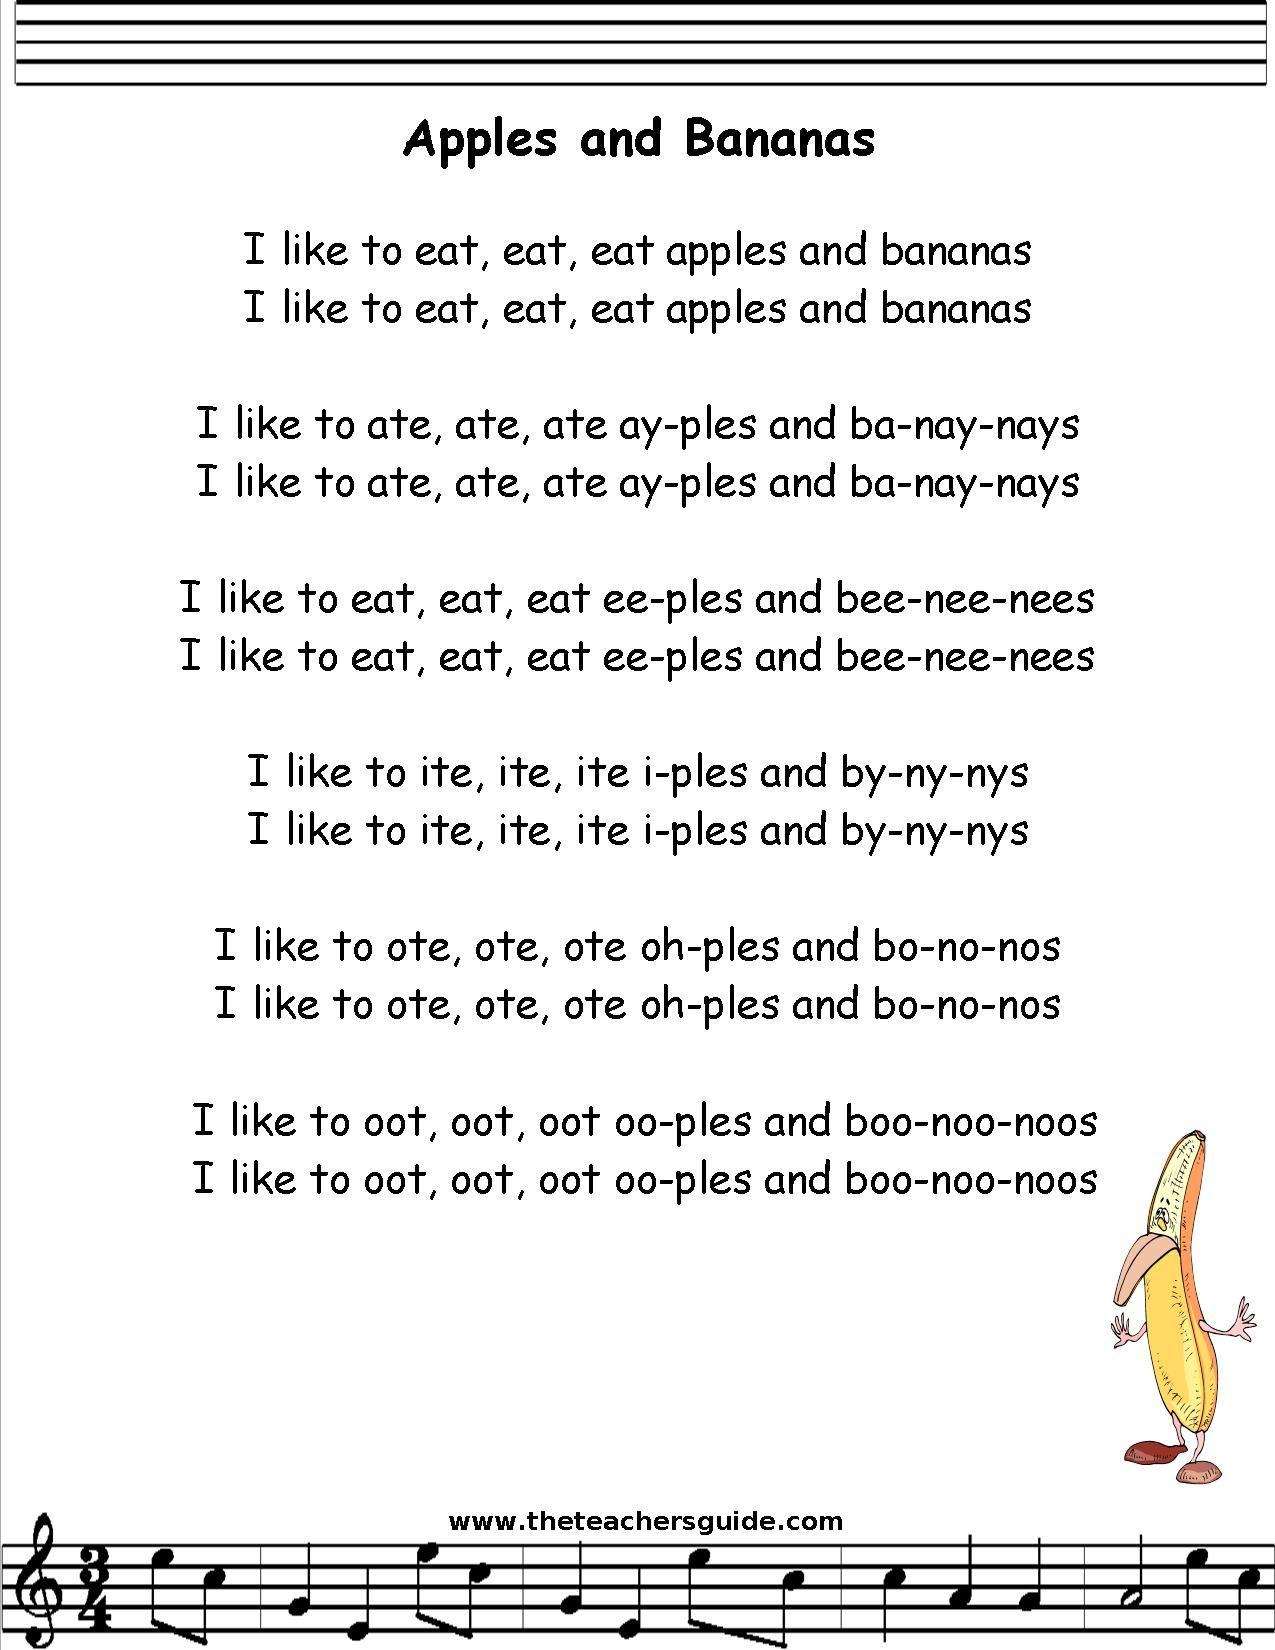 Apples And Bananas Lyrics Printout